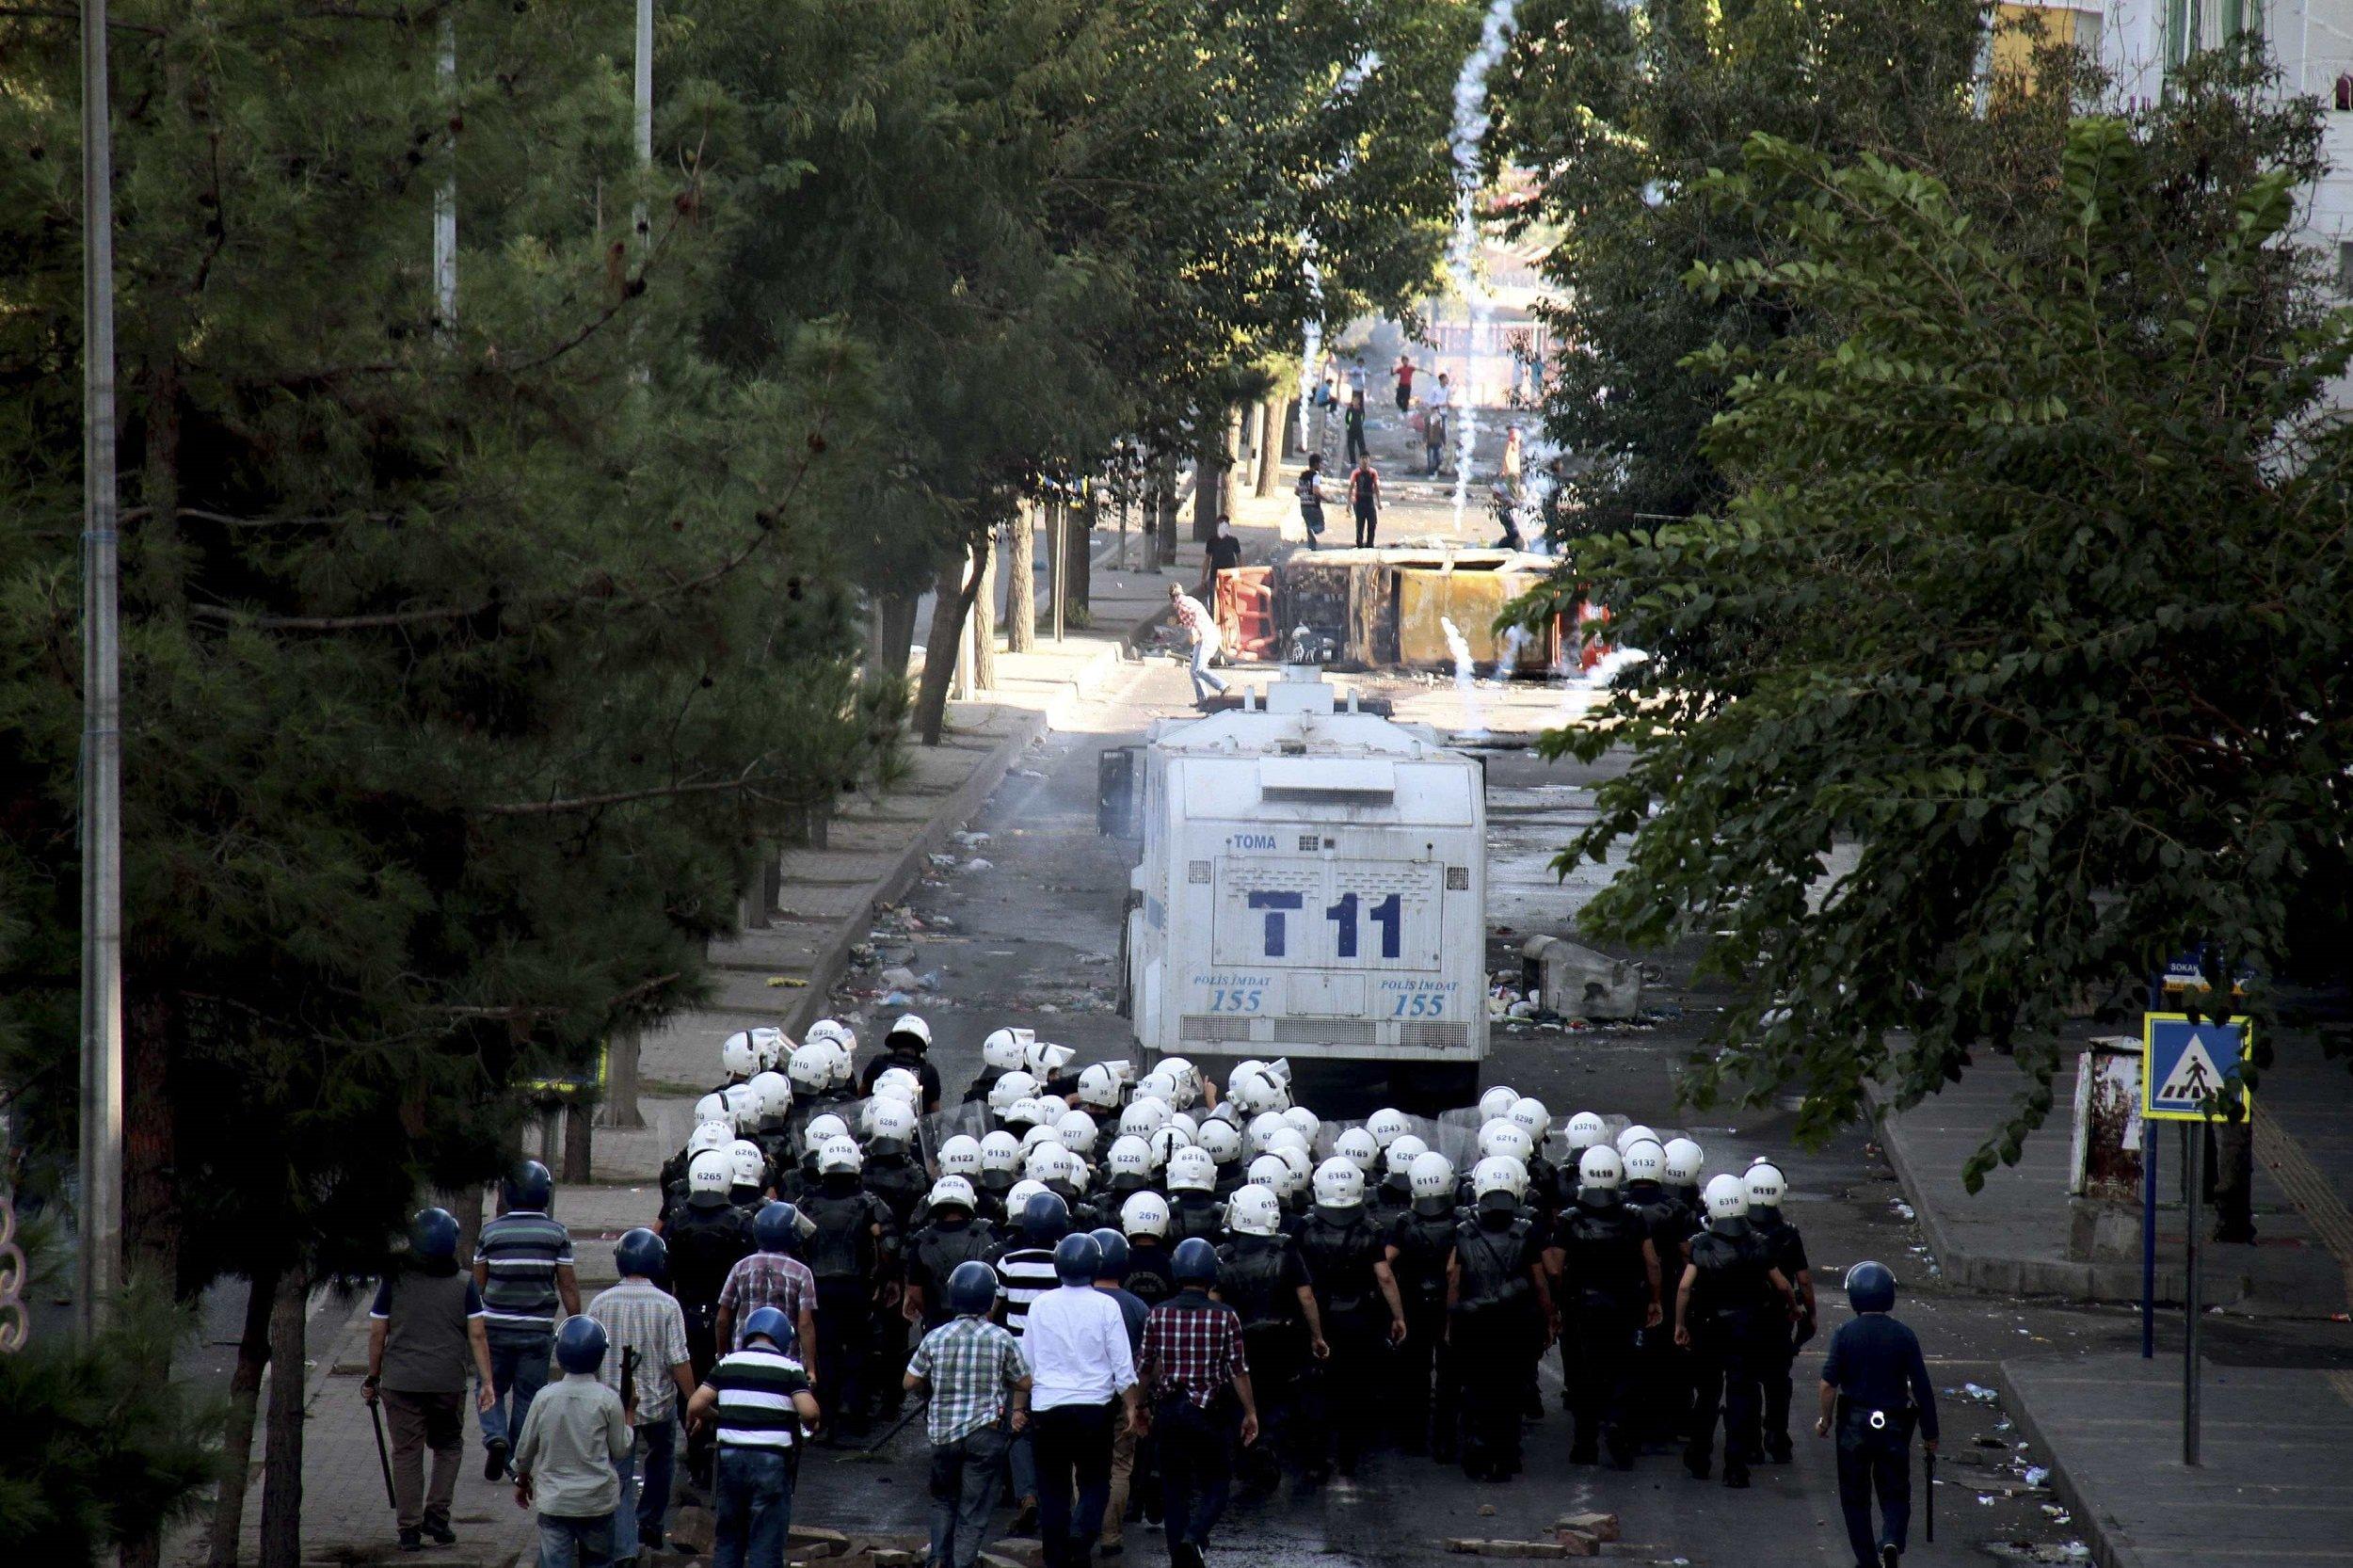 kurdish protests in turkey